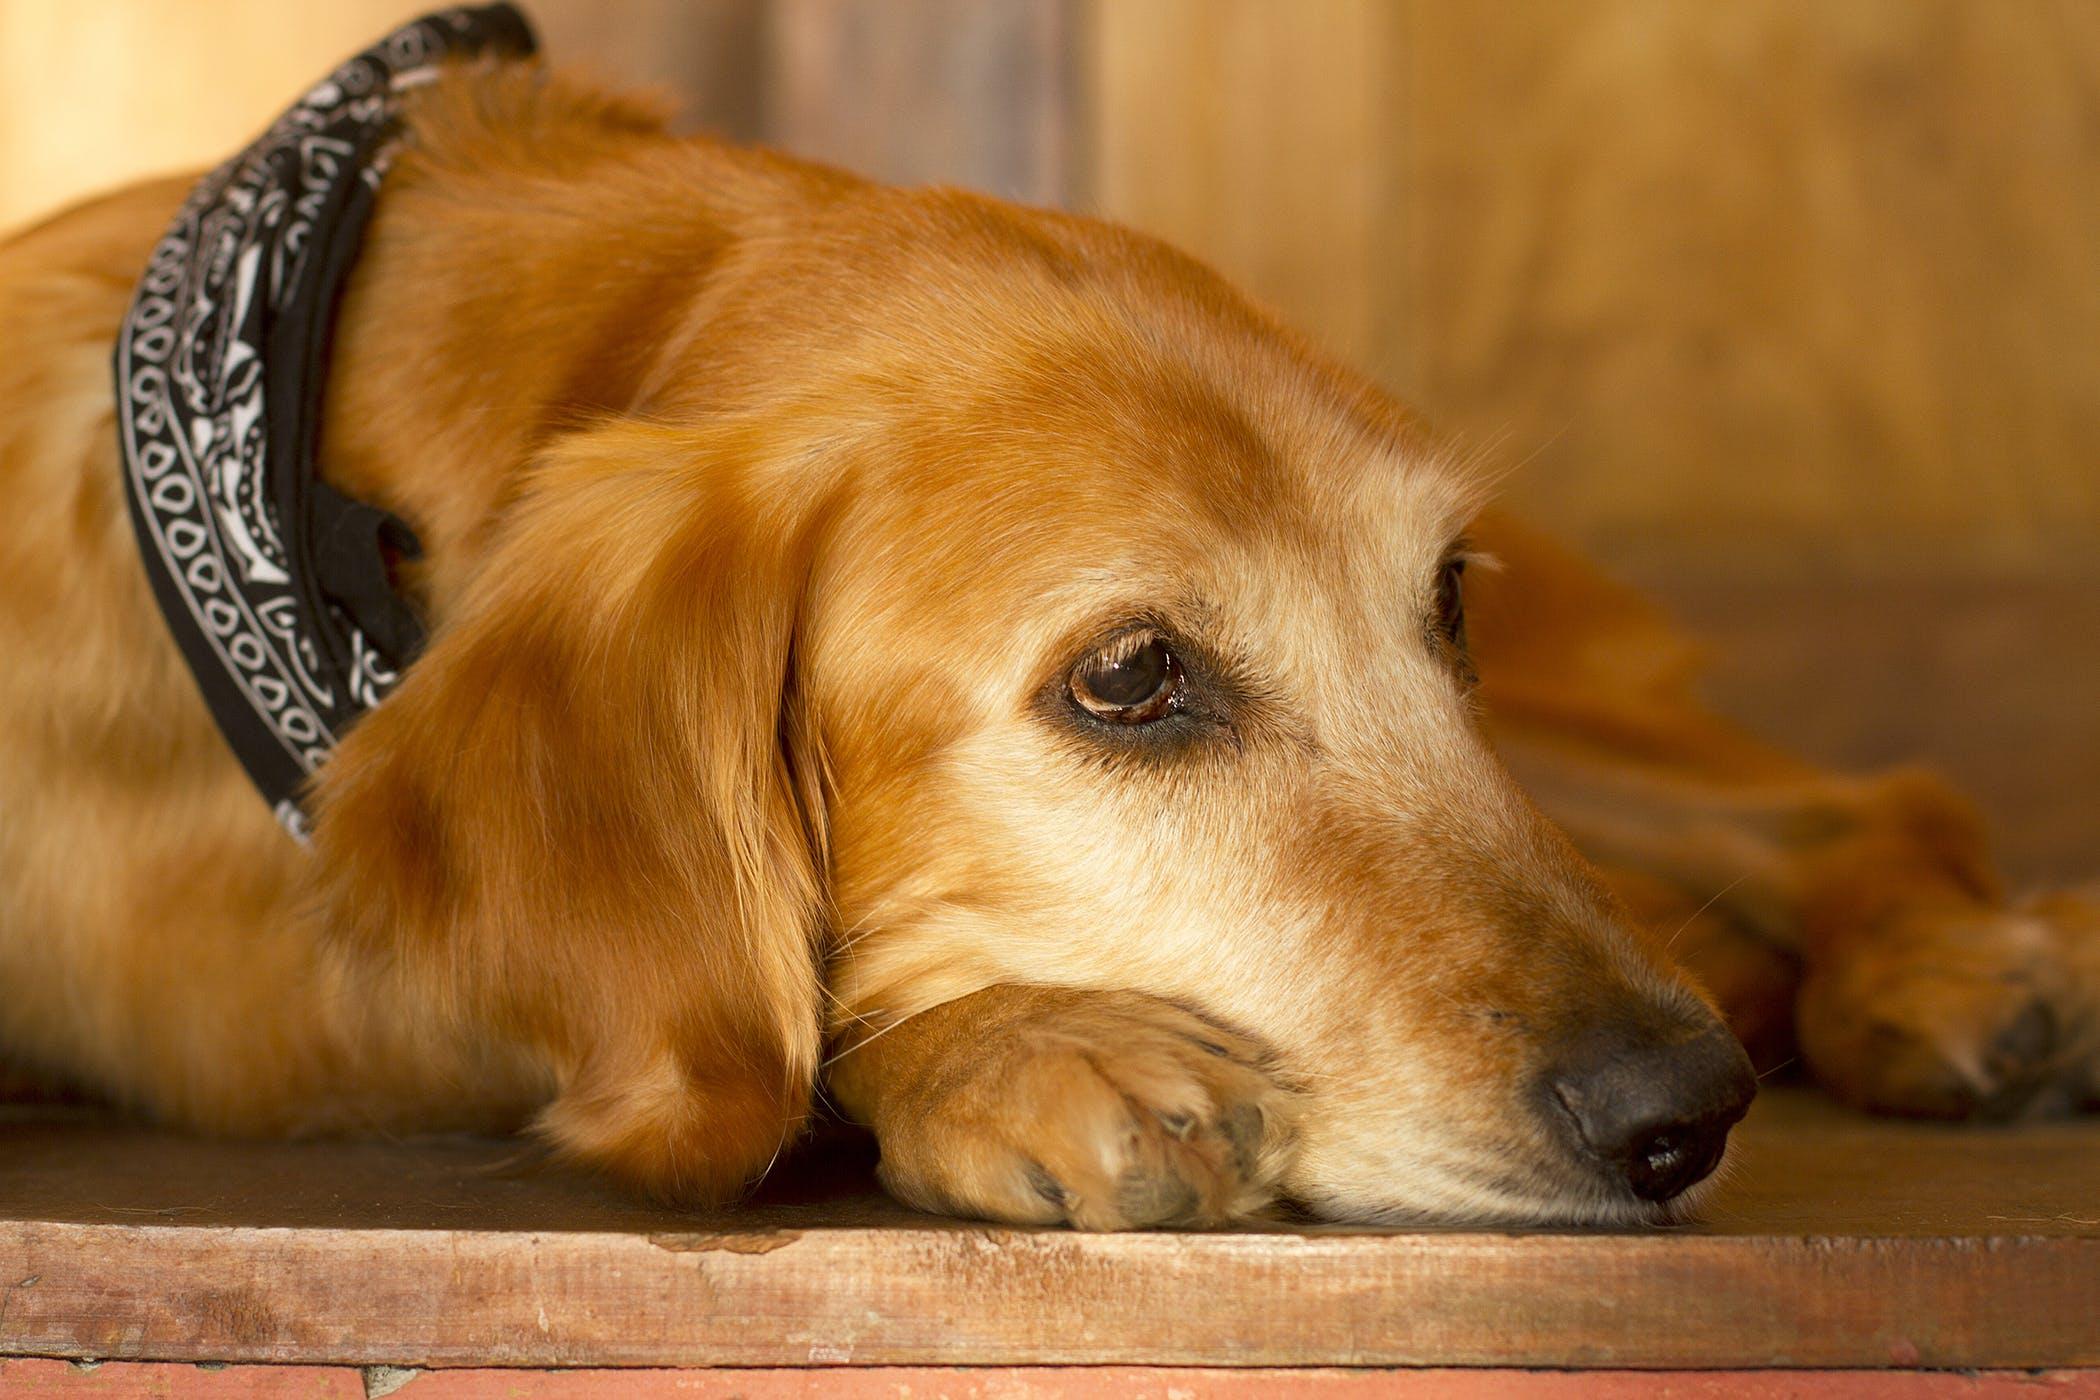 Pericardiocentesis in Dogs